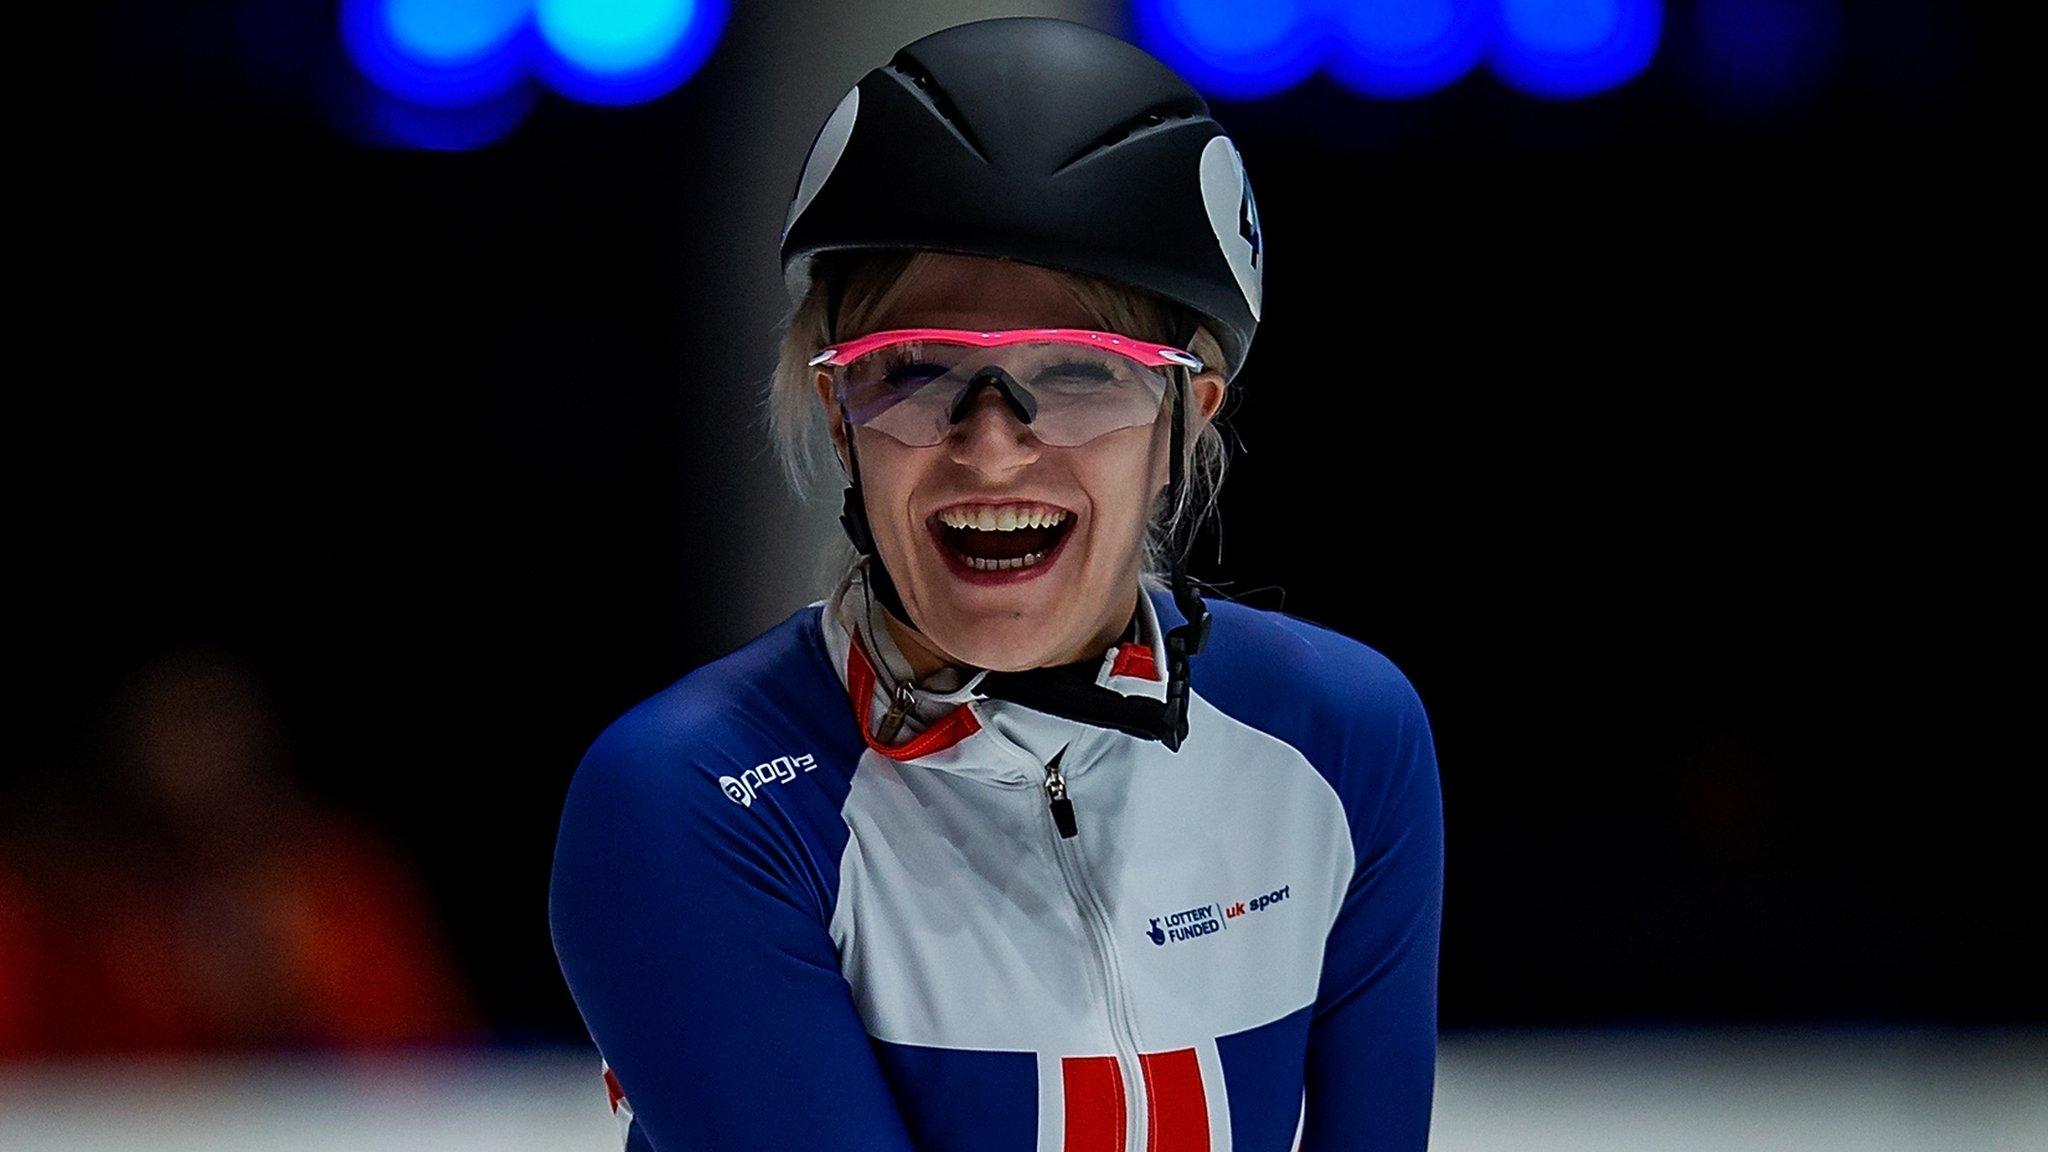 Elise Christie: British short track skater wins European silver on solo skating comeback